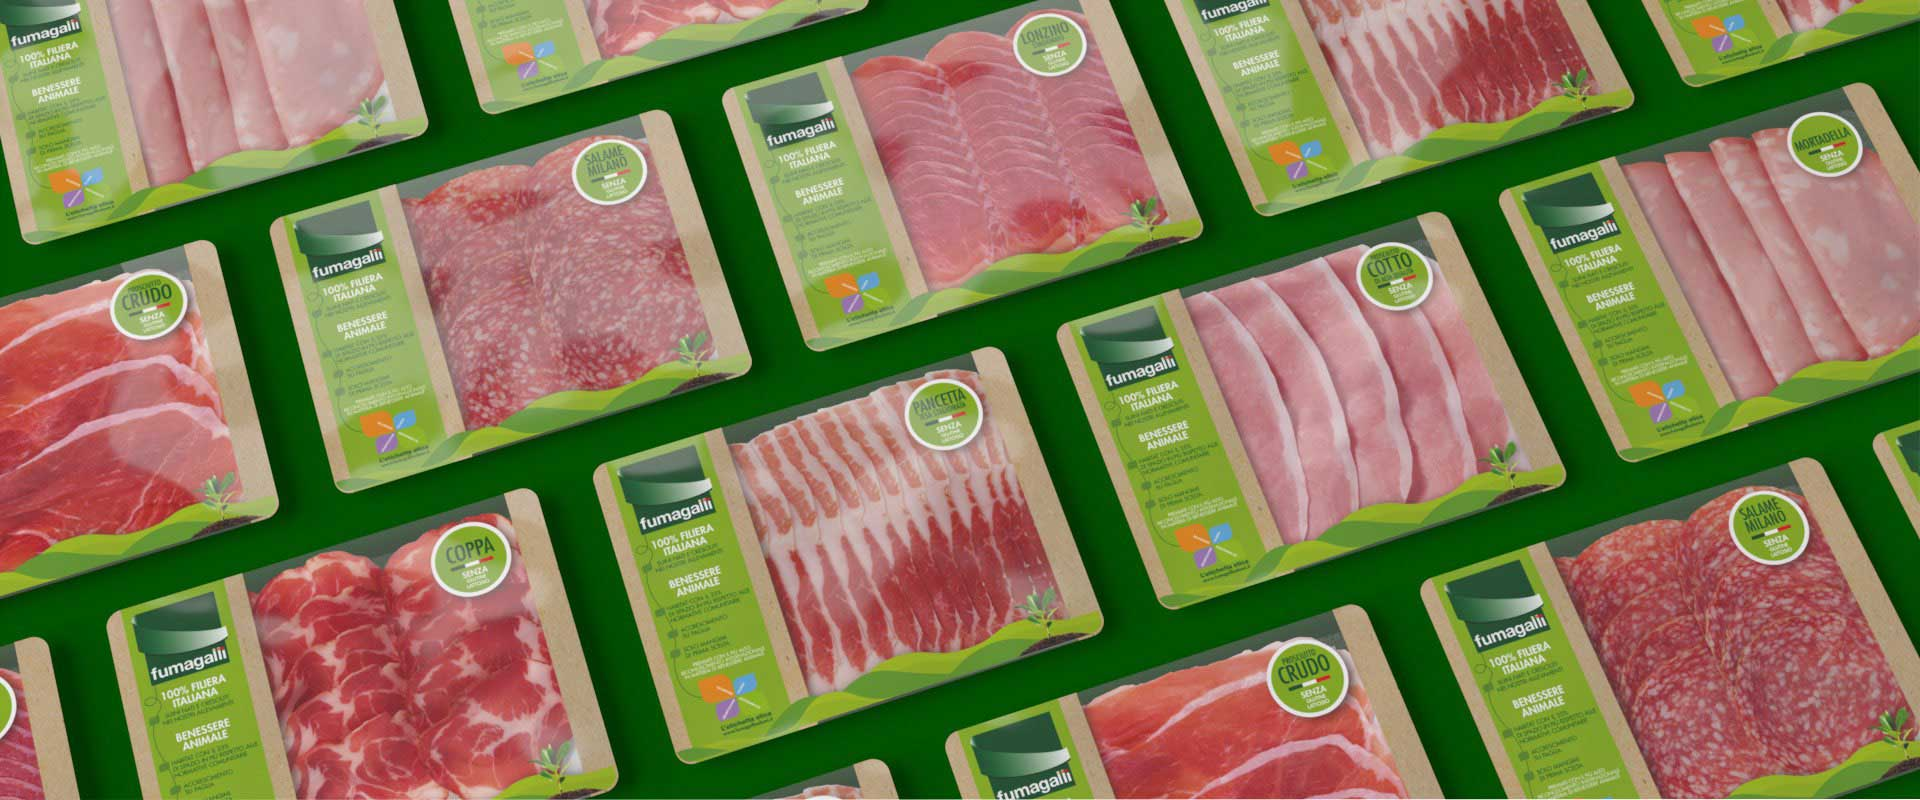 packaging design buste salumi Fumagalli etichetta etica GDO